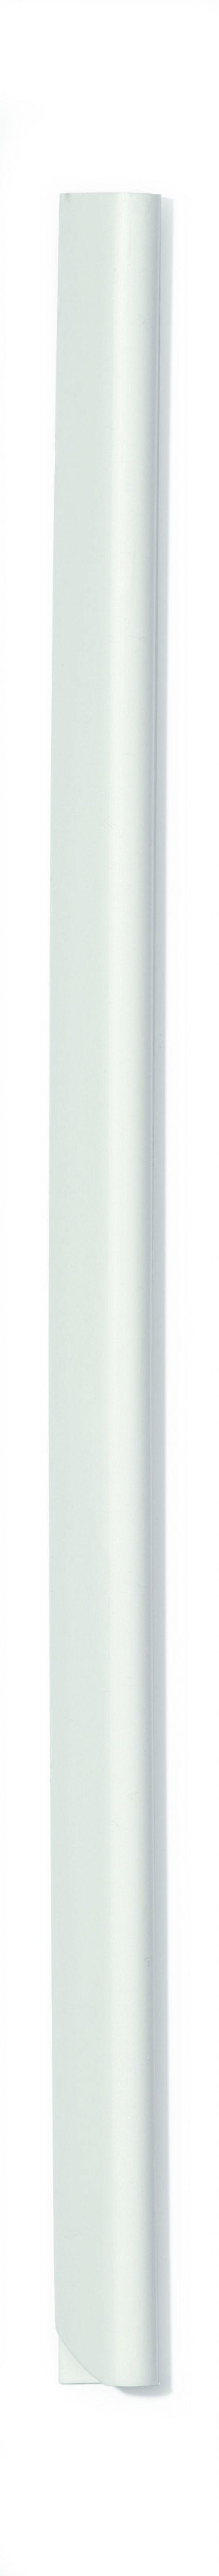 Durable Spine Bar A4 6mm White 290102 (PK100)